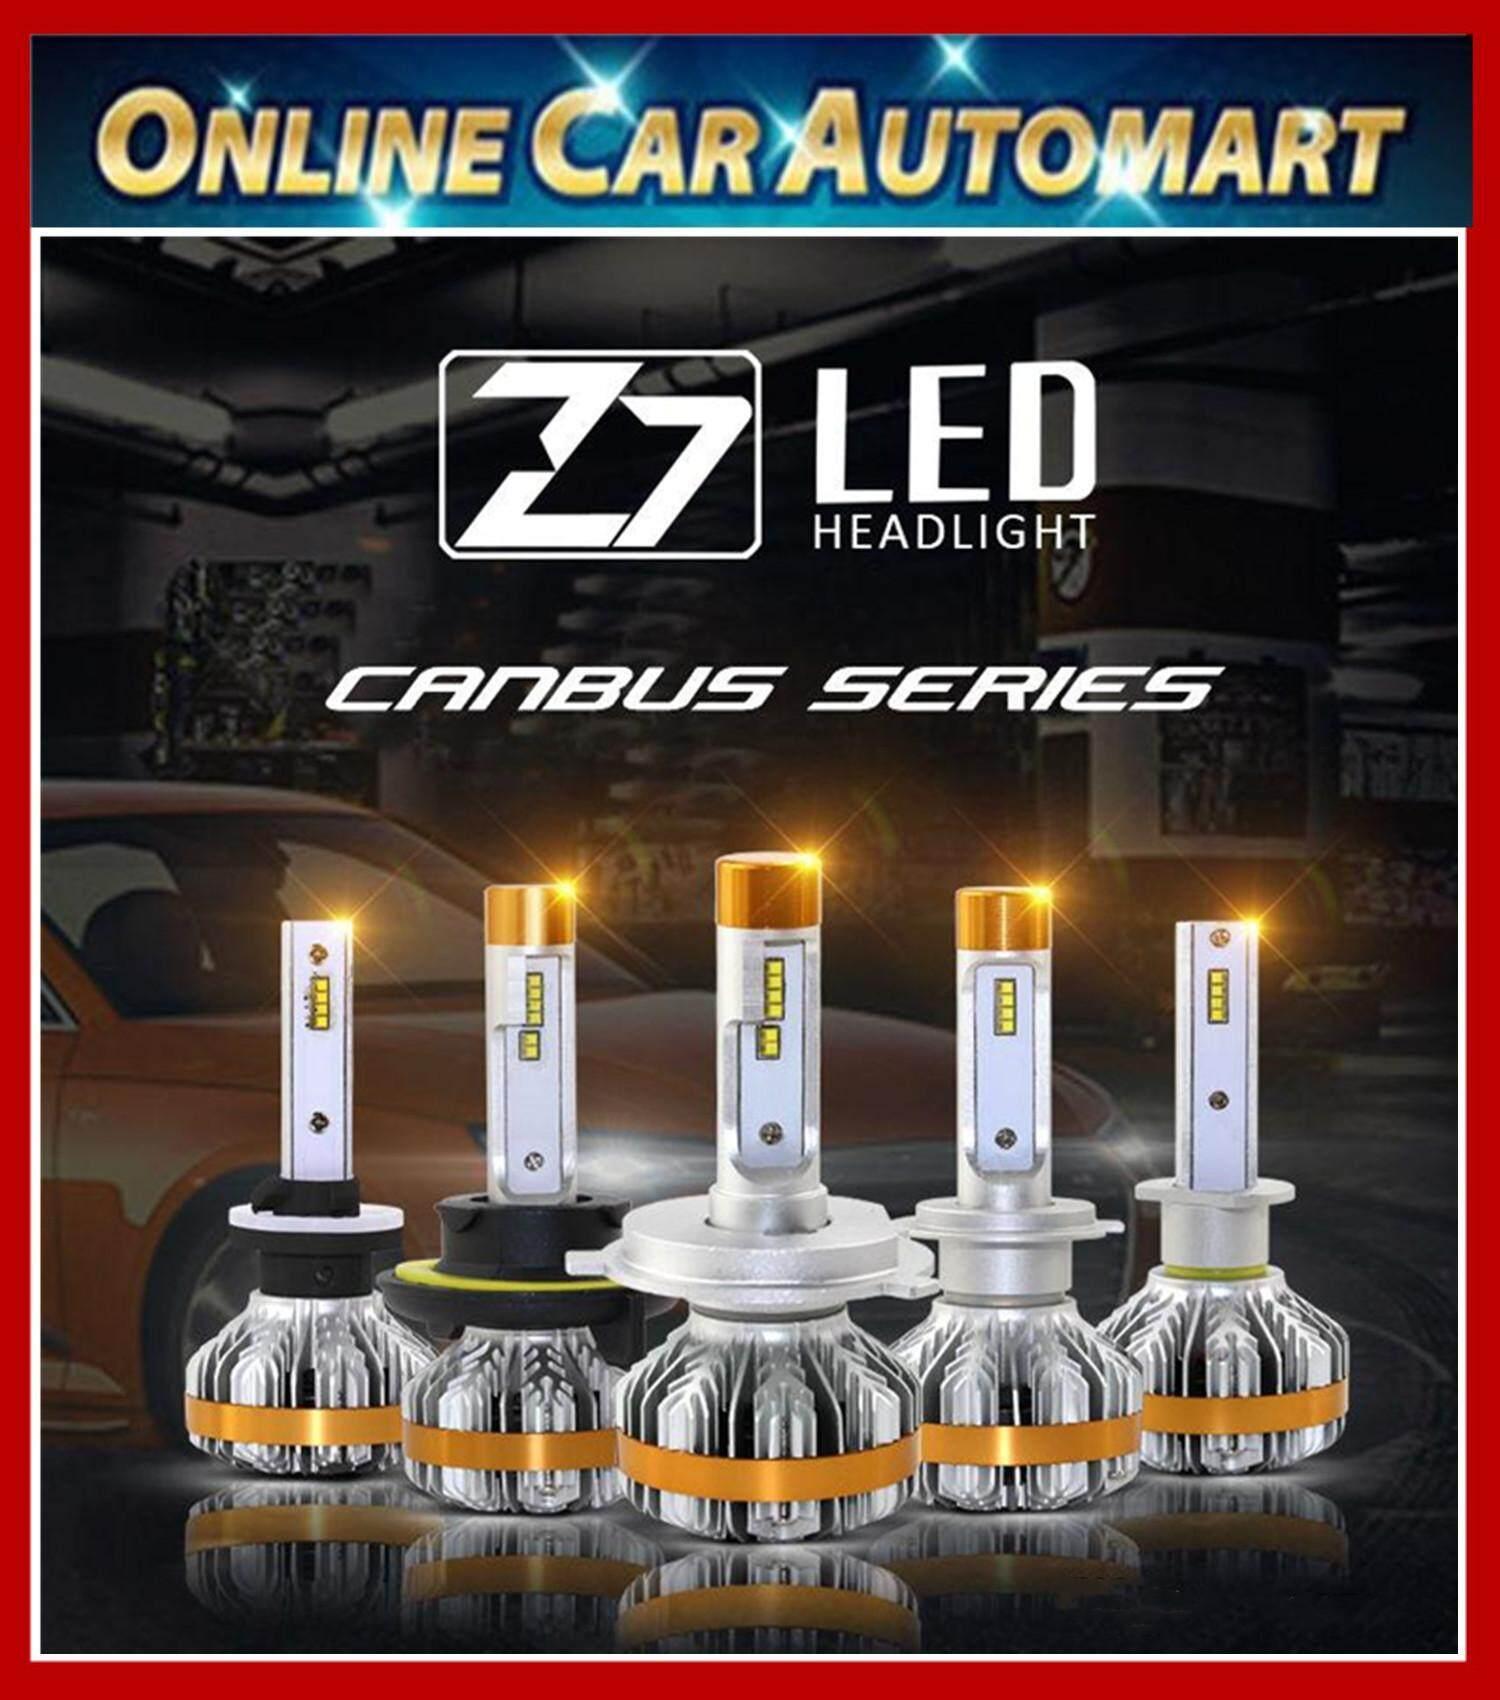 Isuzu D\'Max-Z7 LED Headlight Auto Head light Lamp 6500k White